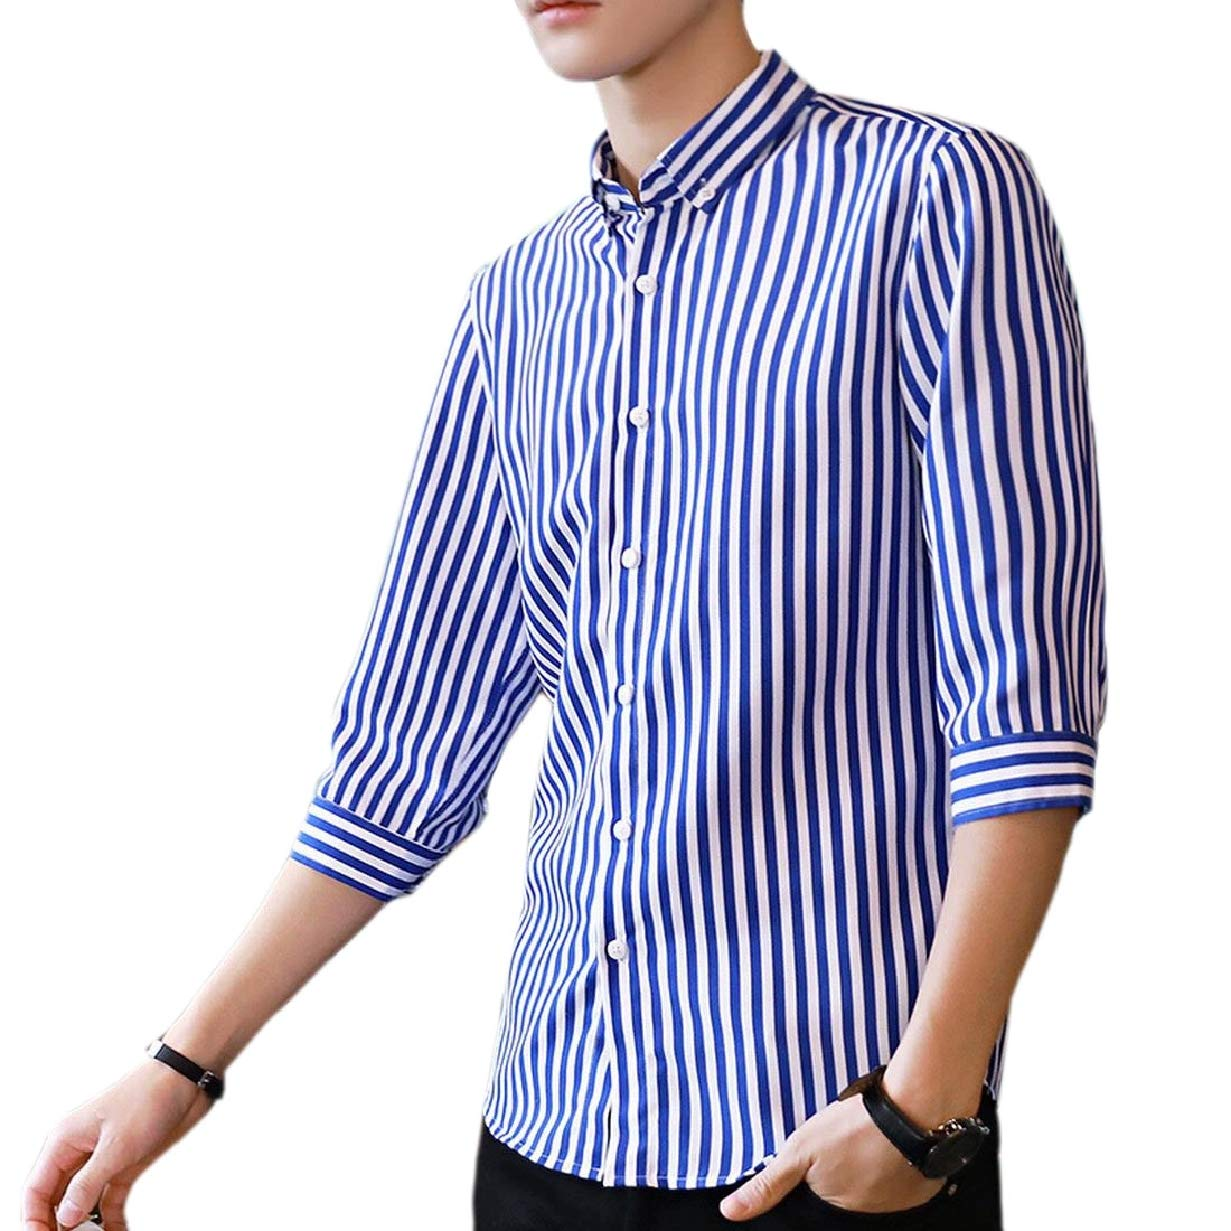 CBTLVSN Mens Funny Slim Classic Cardigan Striped Half Sleeve Dress Shirt Tops